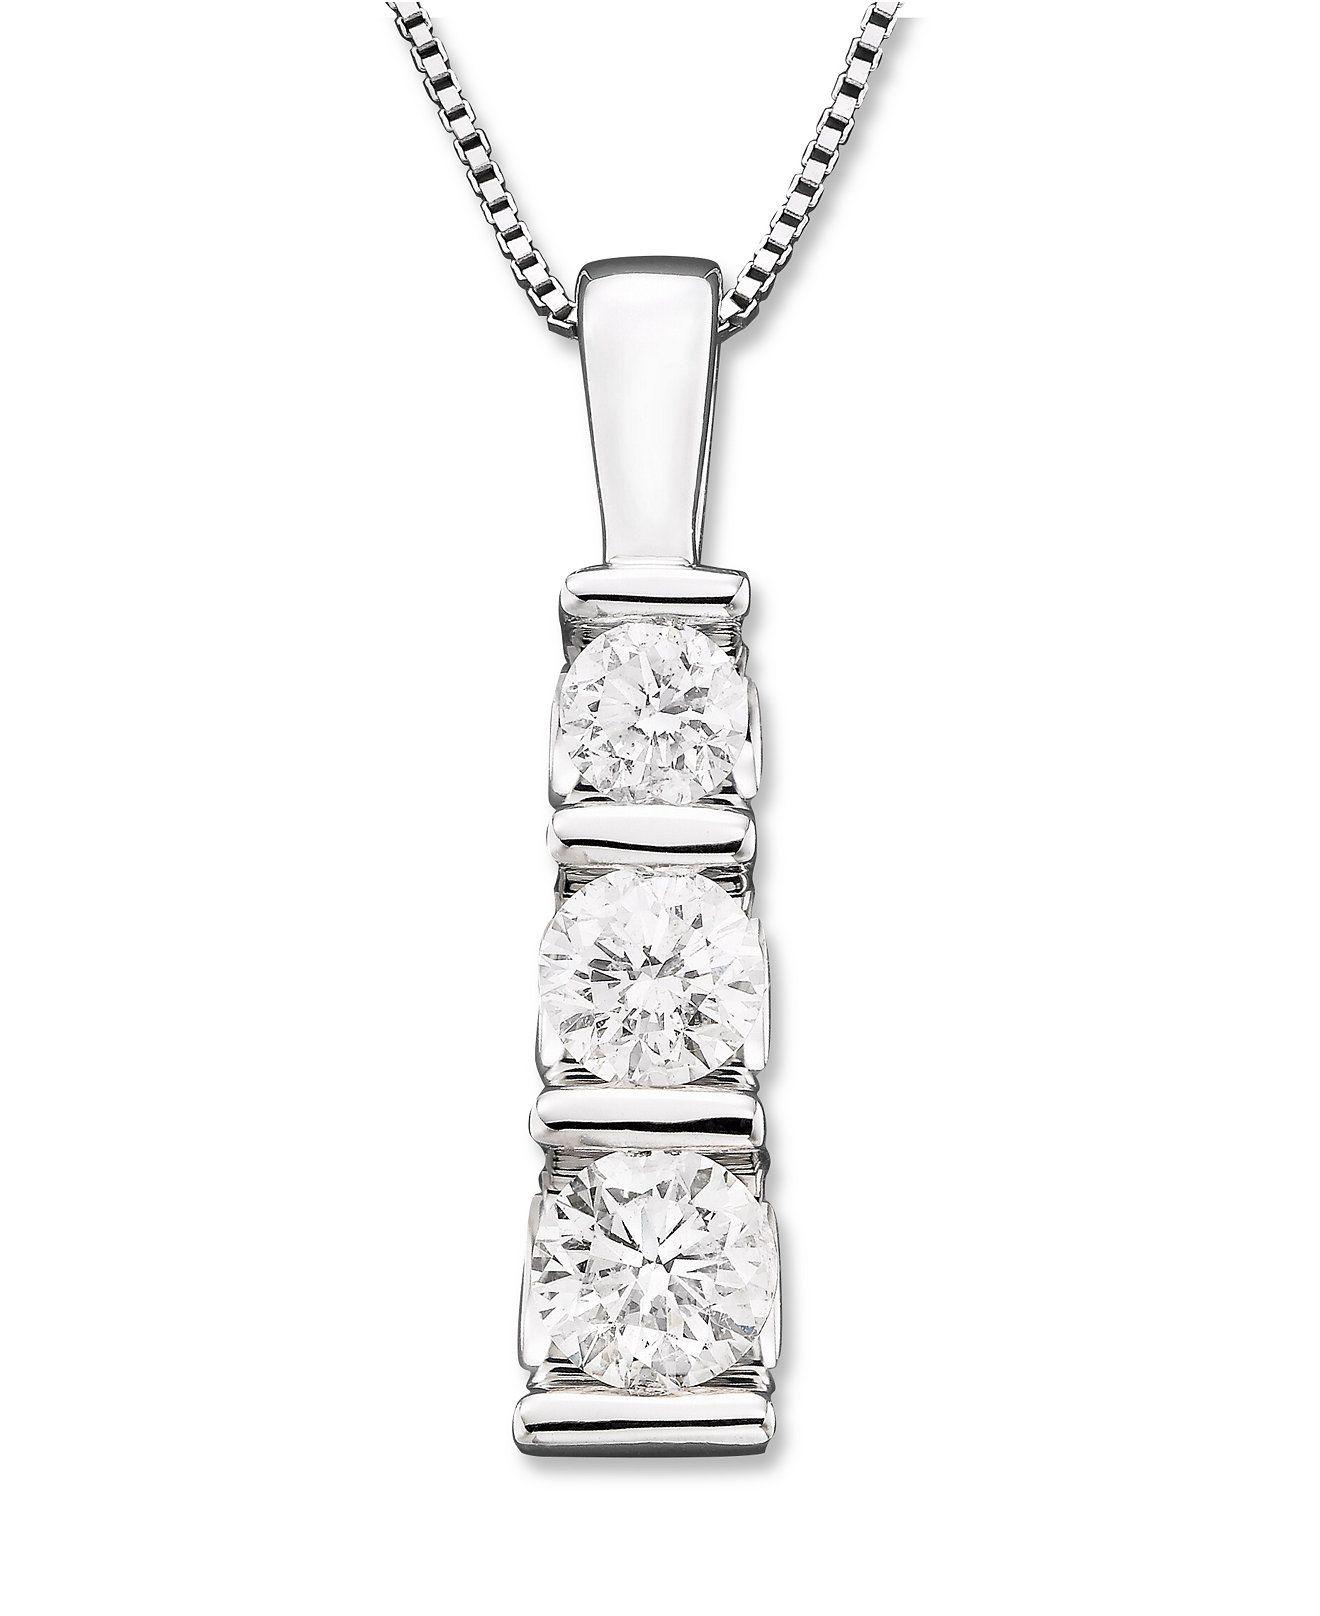 Three stone diamond pendant necklace in 14k white gold 12 ct tw three stone diamond pendant necklace in 14k white gold 12 ct tw mozeypictures Image collections